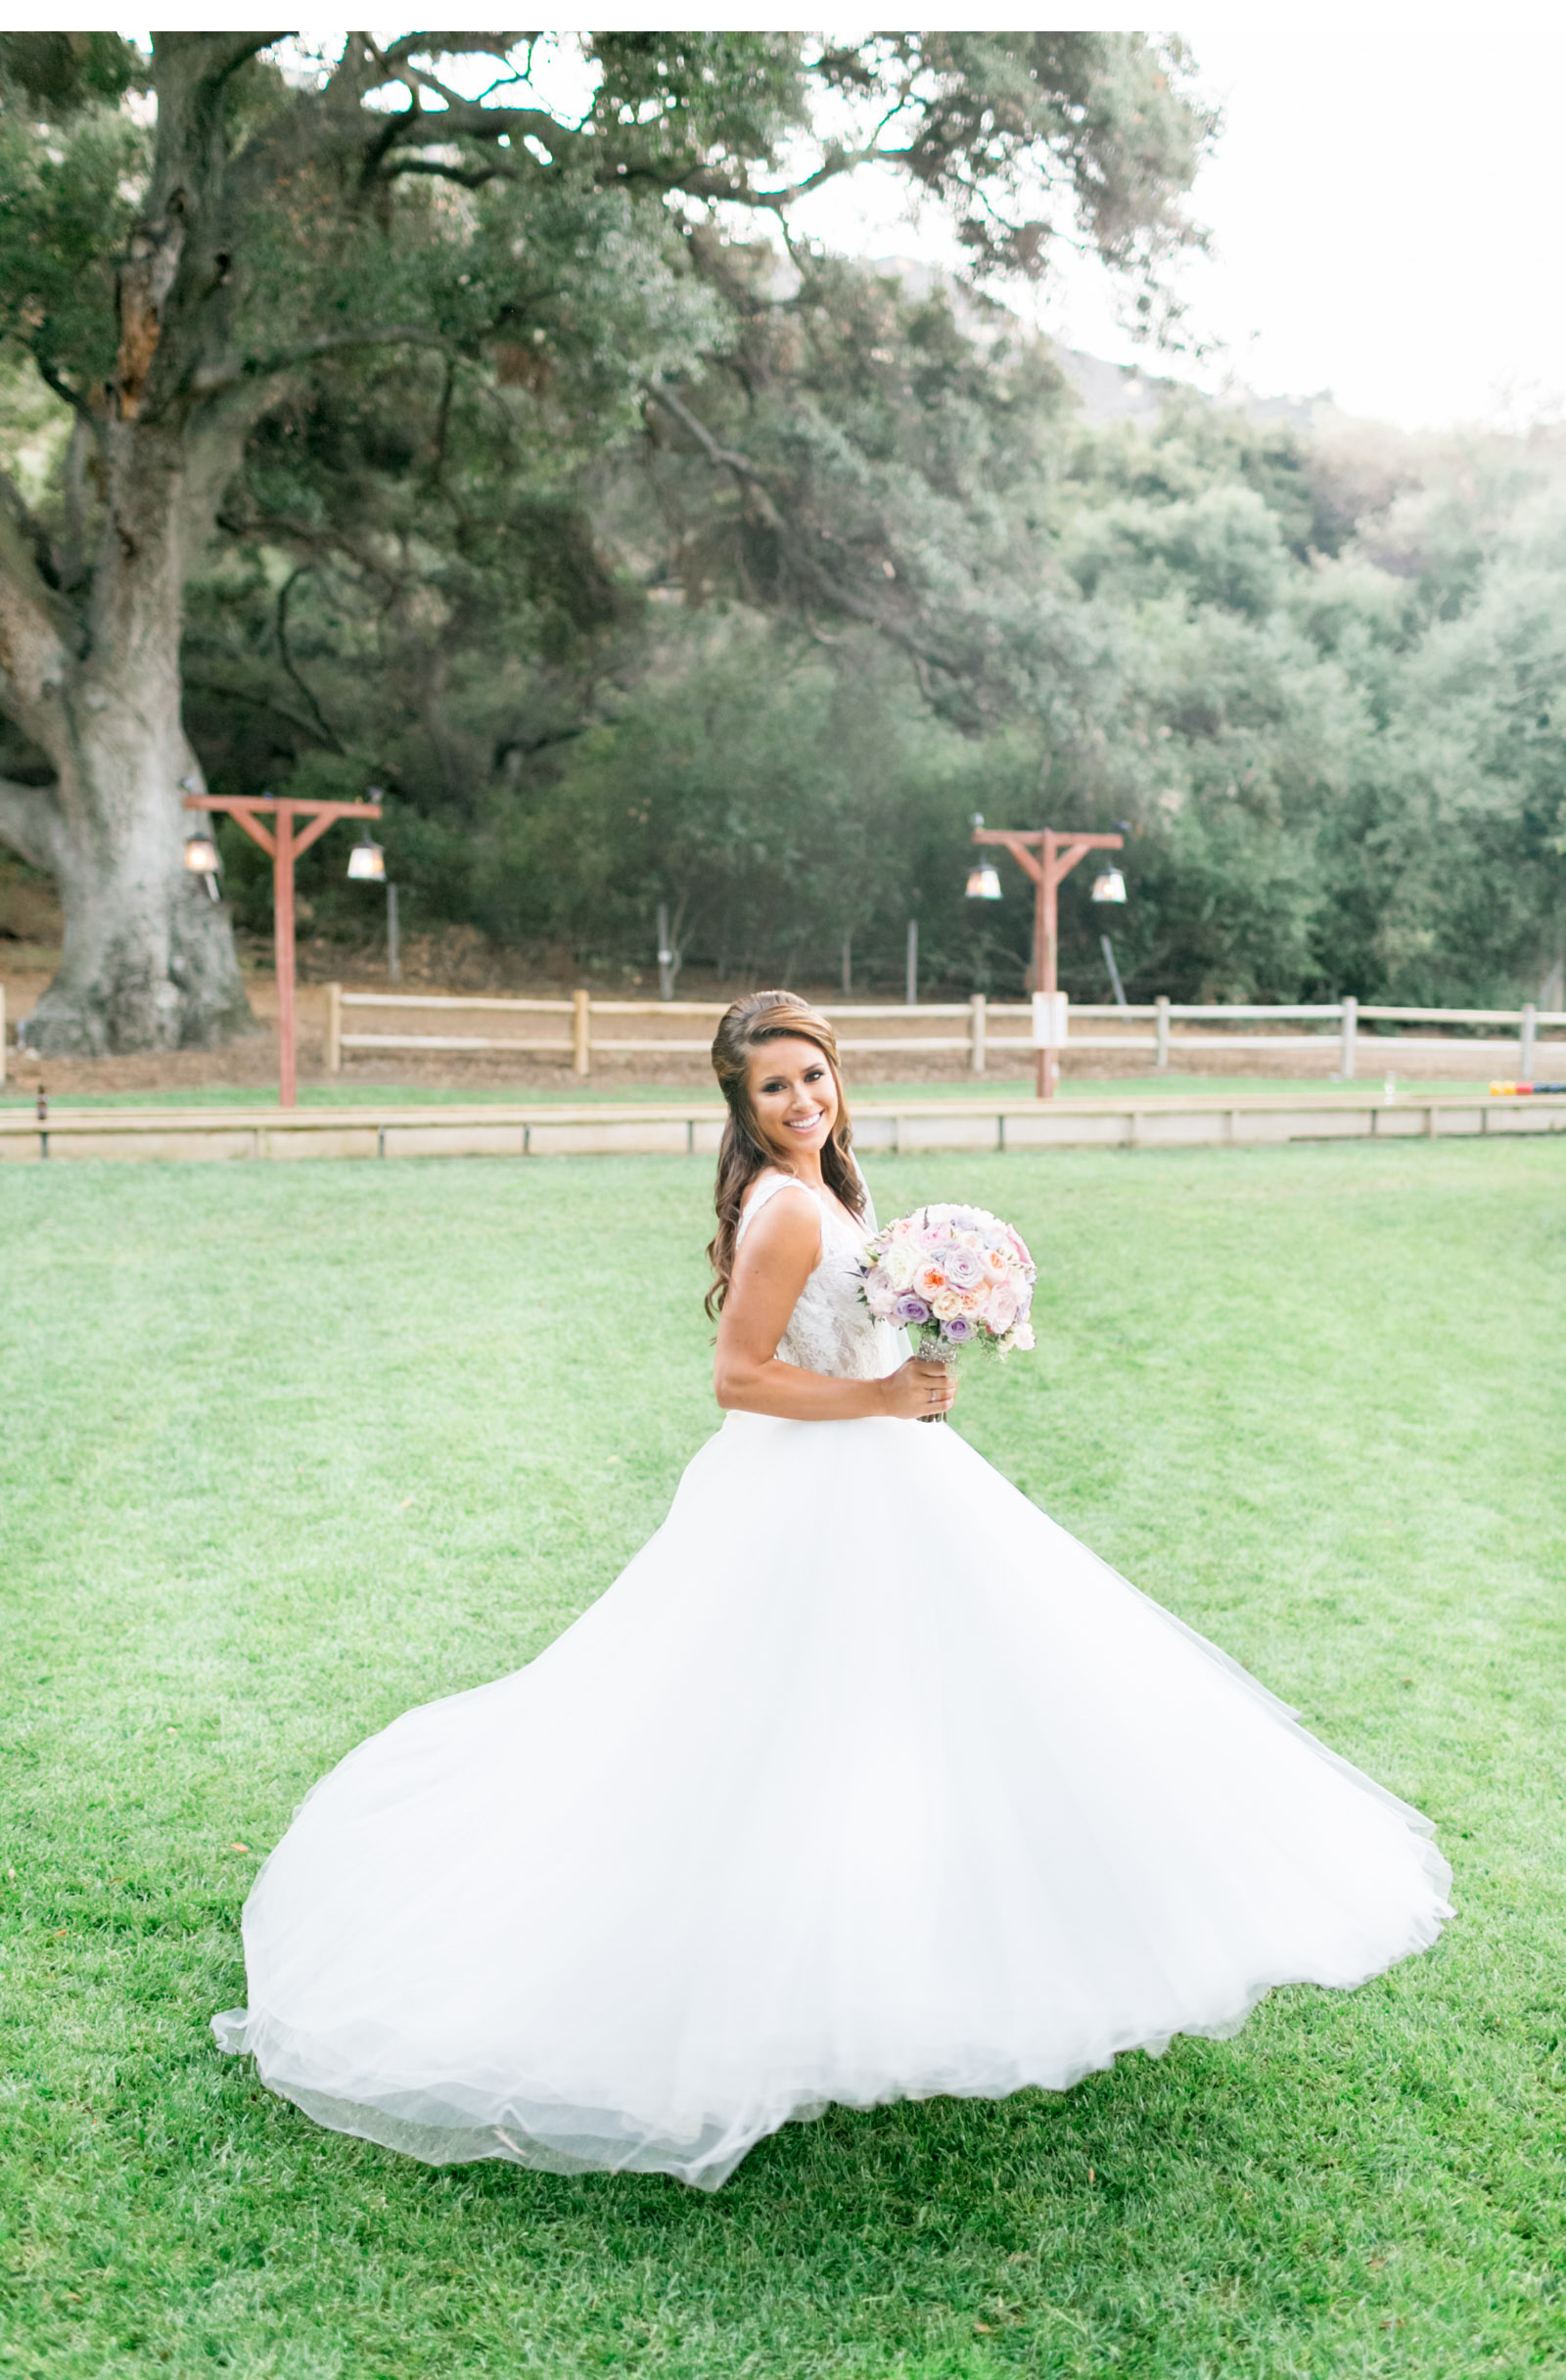 Nia-Sanchez-Temcula-Wedding-Natalie-Schutt-Photography_03.jpg